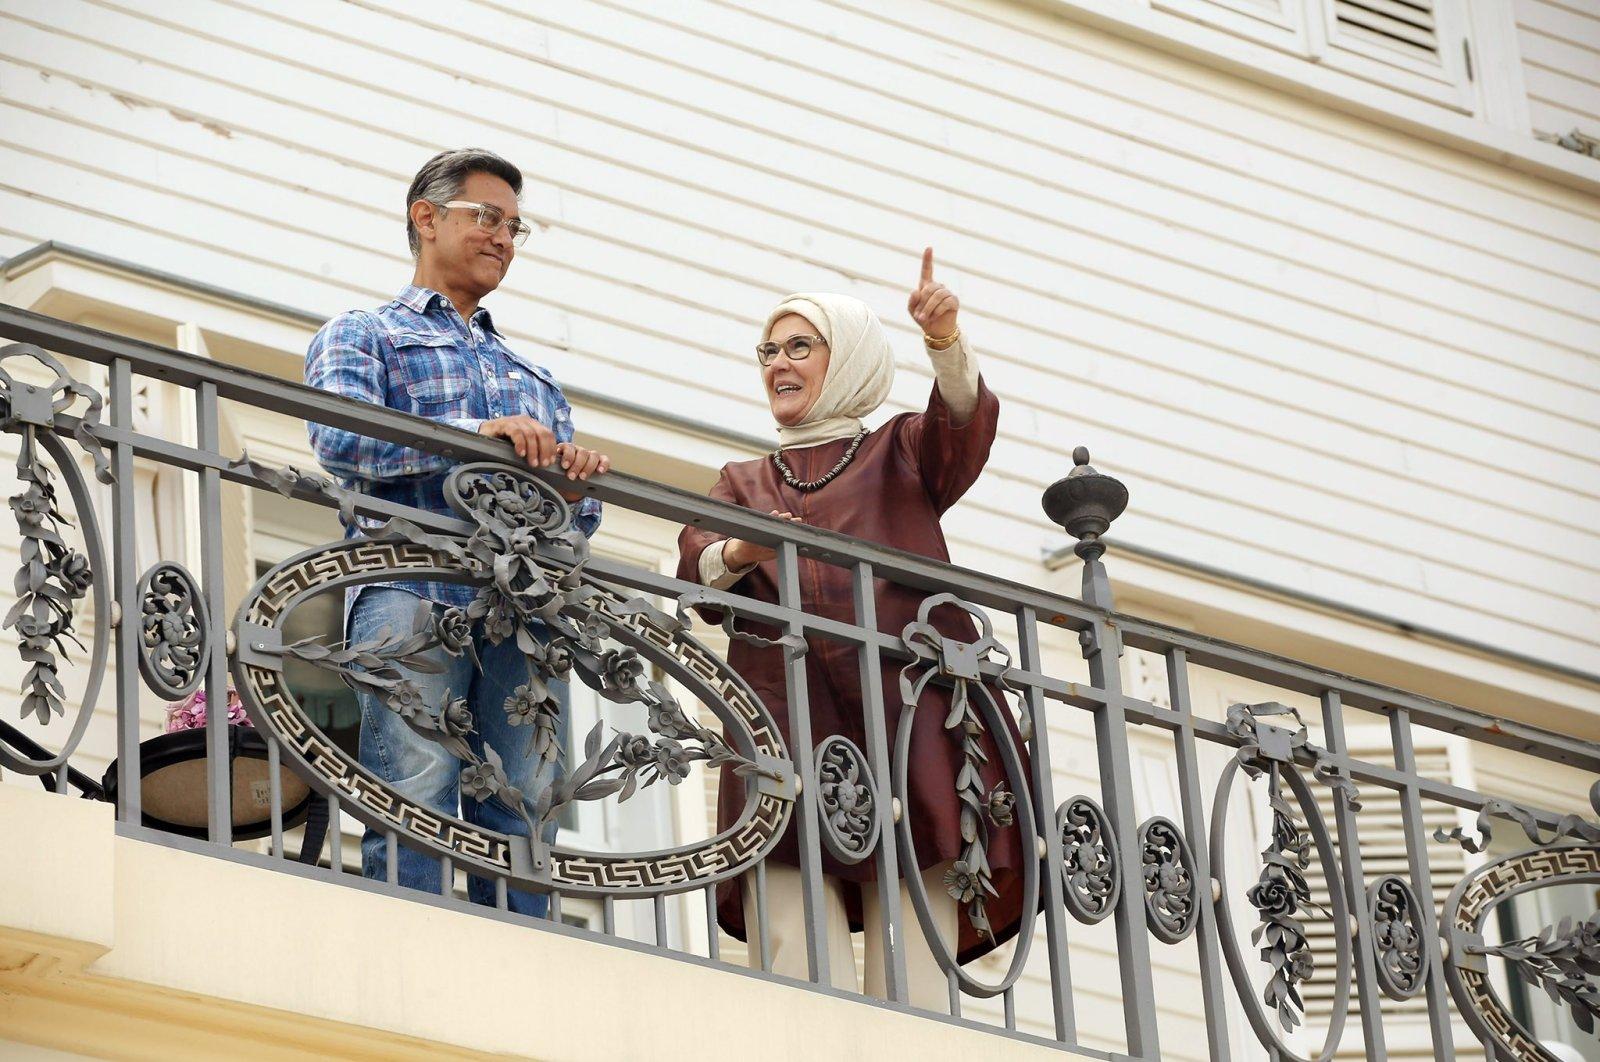 First lady Emine Erdoğan meets Indian actor Aamir Khan during his visit to Turkey, the Turkish Republic Presidential Huber Mansion, Istanbul, Turkey, Aug. 15, 2020. (Photo: Twitter/@EmineErdogan)